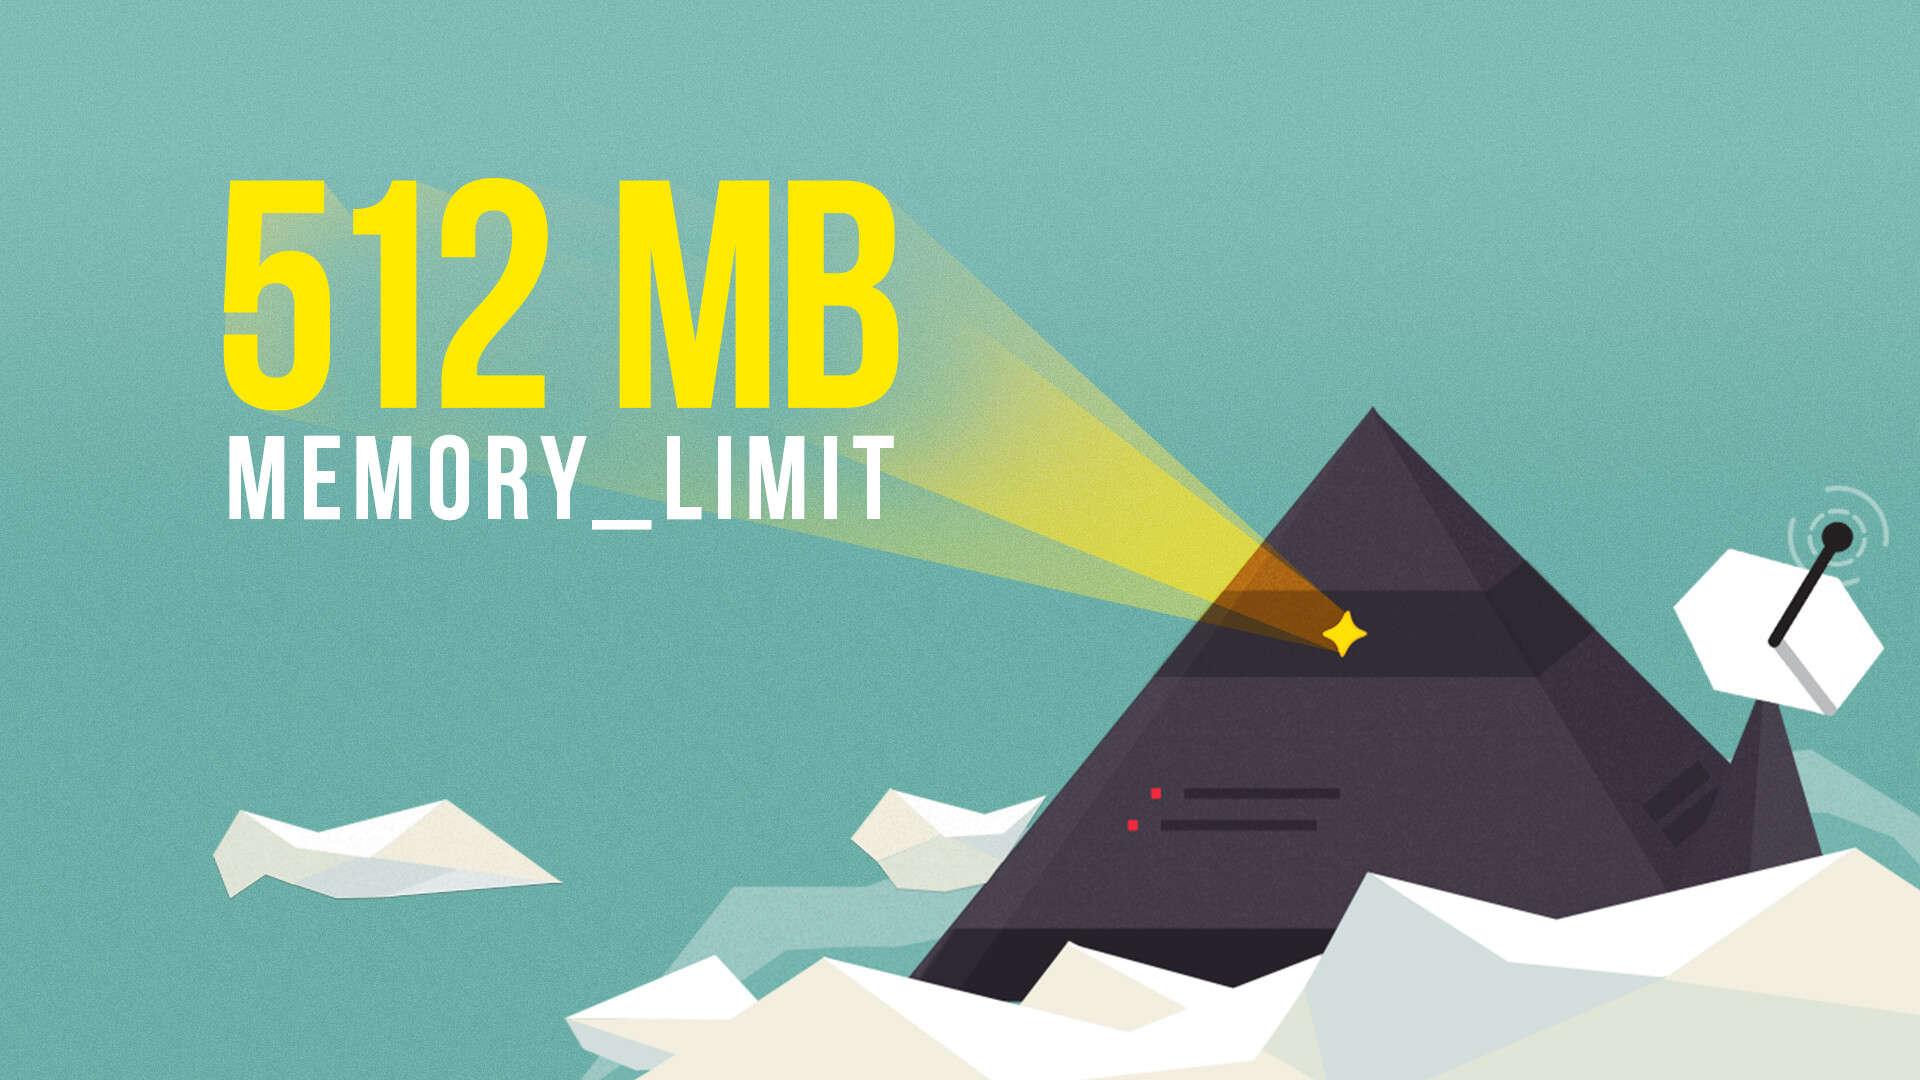 512MB memory limit